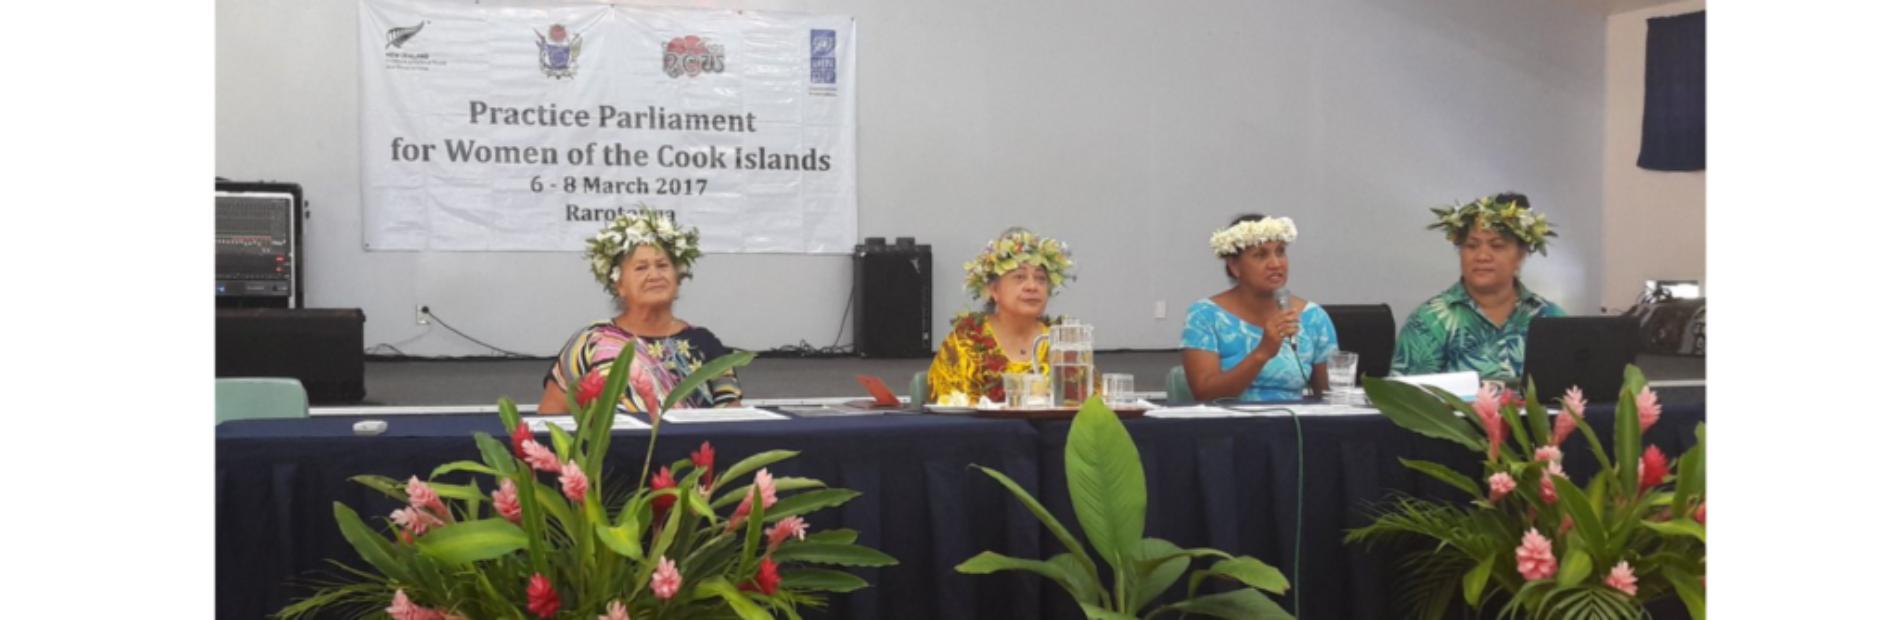 Cook Islands Practice Parliament for women, 2016